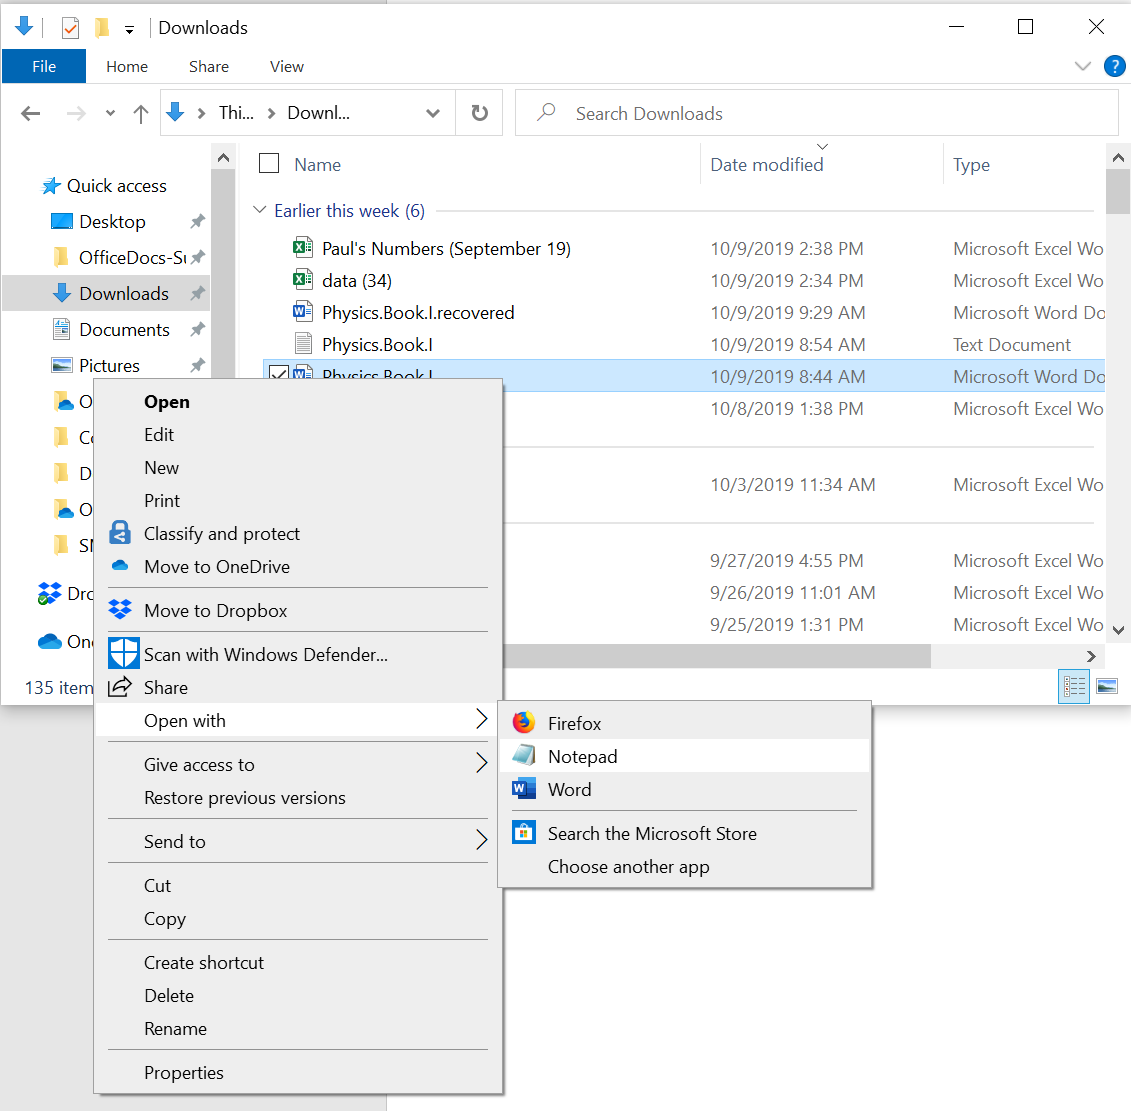 Problembehandlung Bei Beschadigten Dokumenten In Word Microsoft Docs